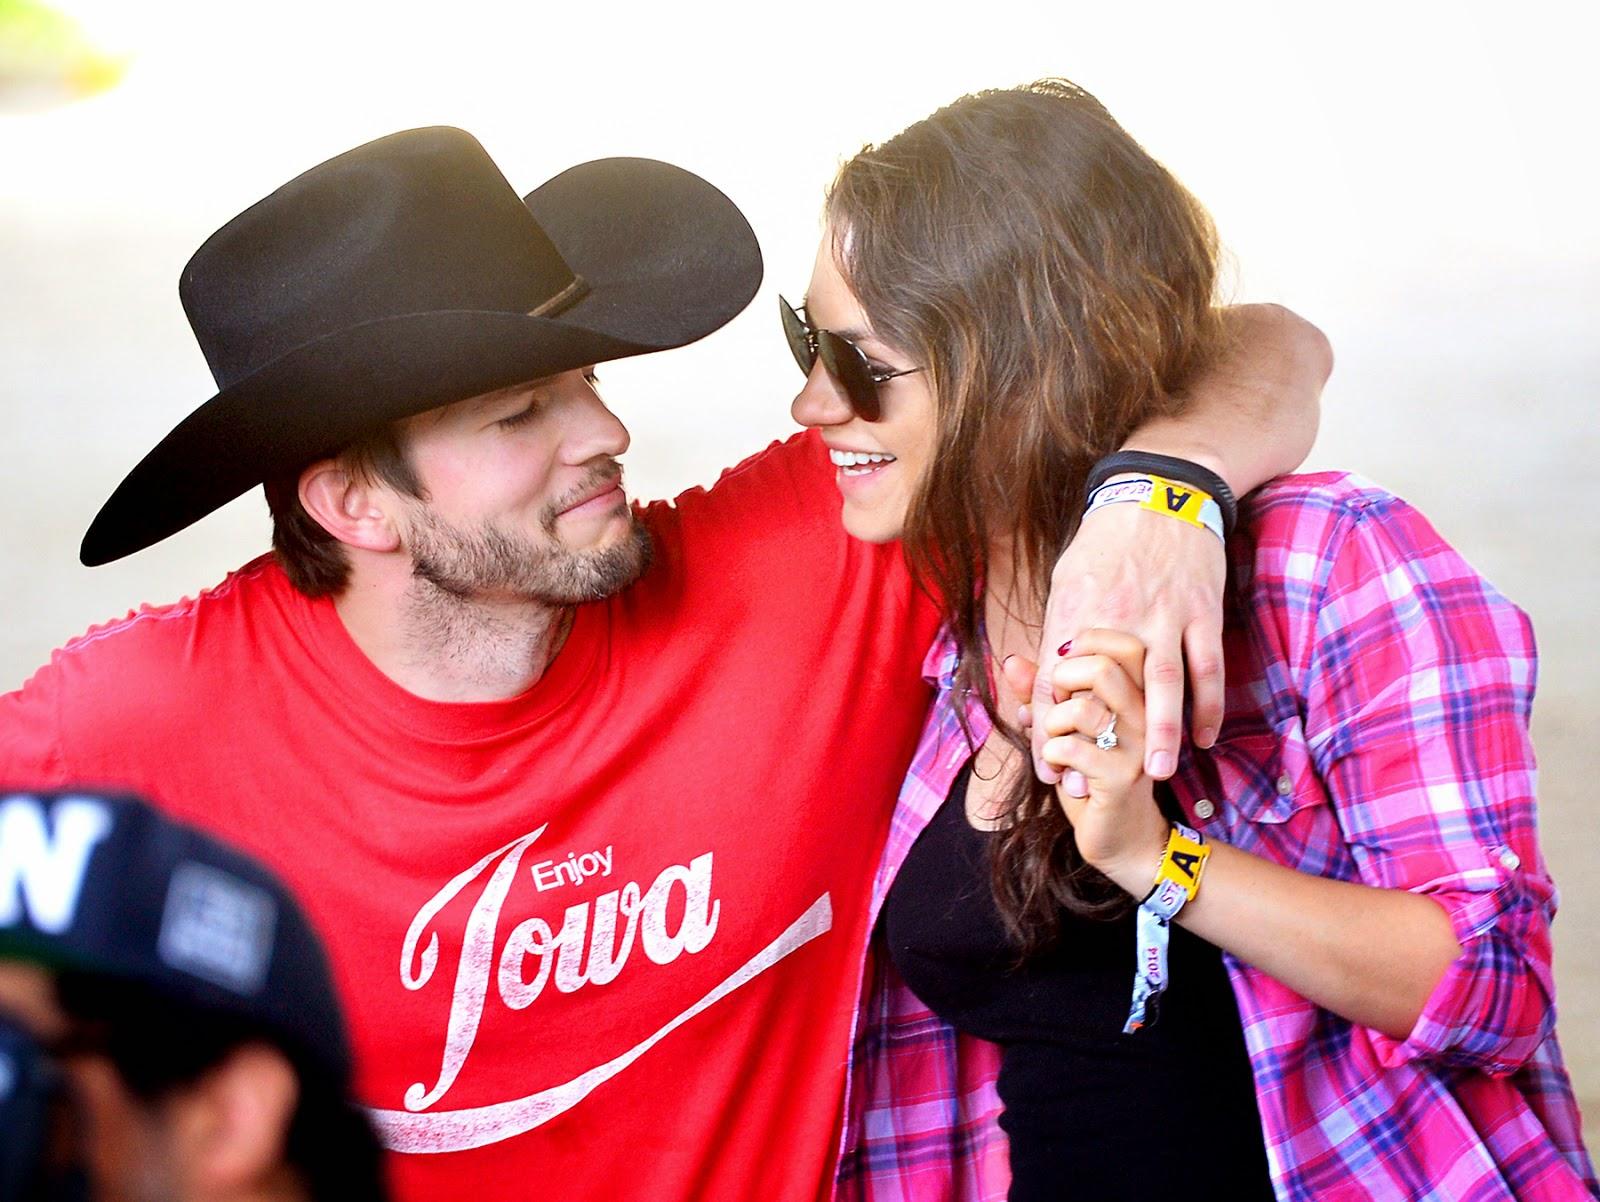 ashton kutcher and mila kunis dating